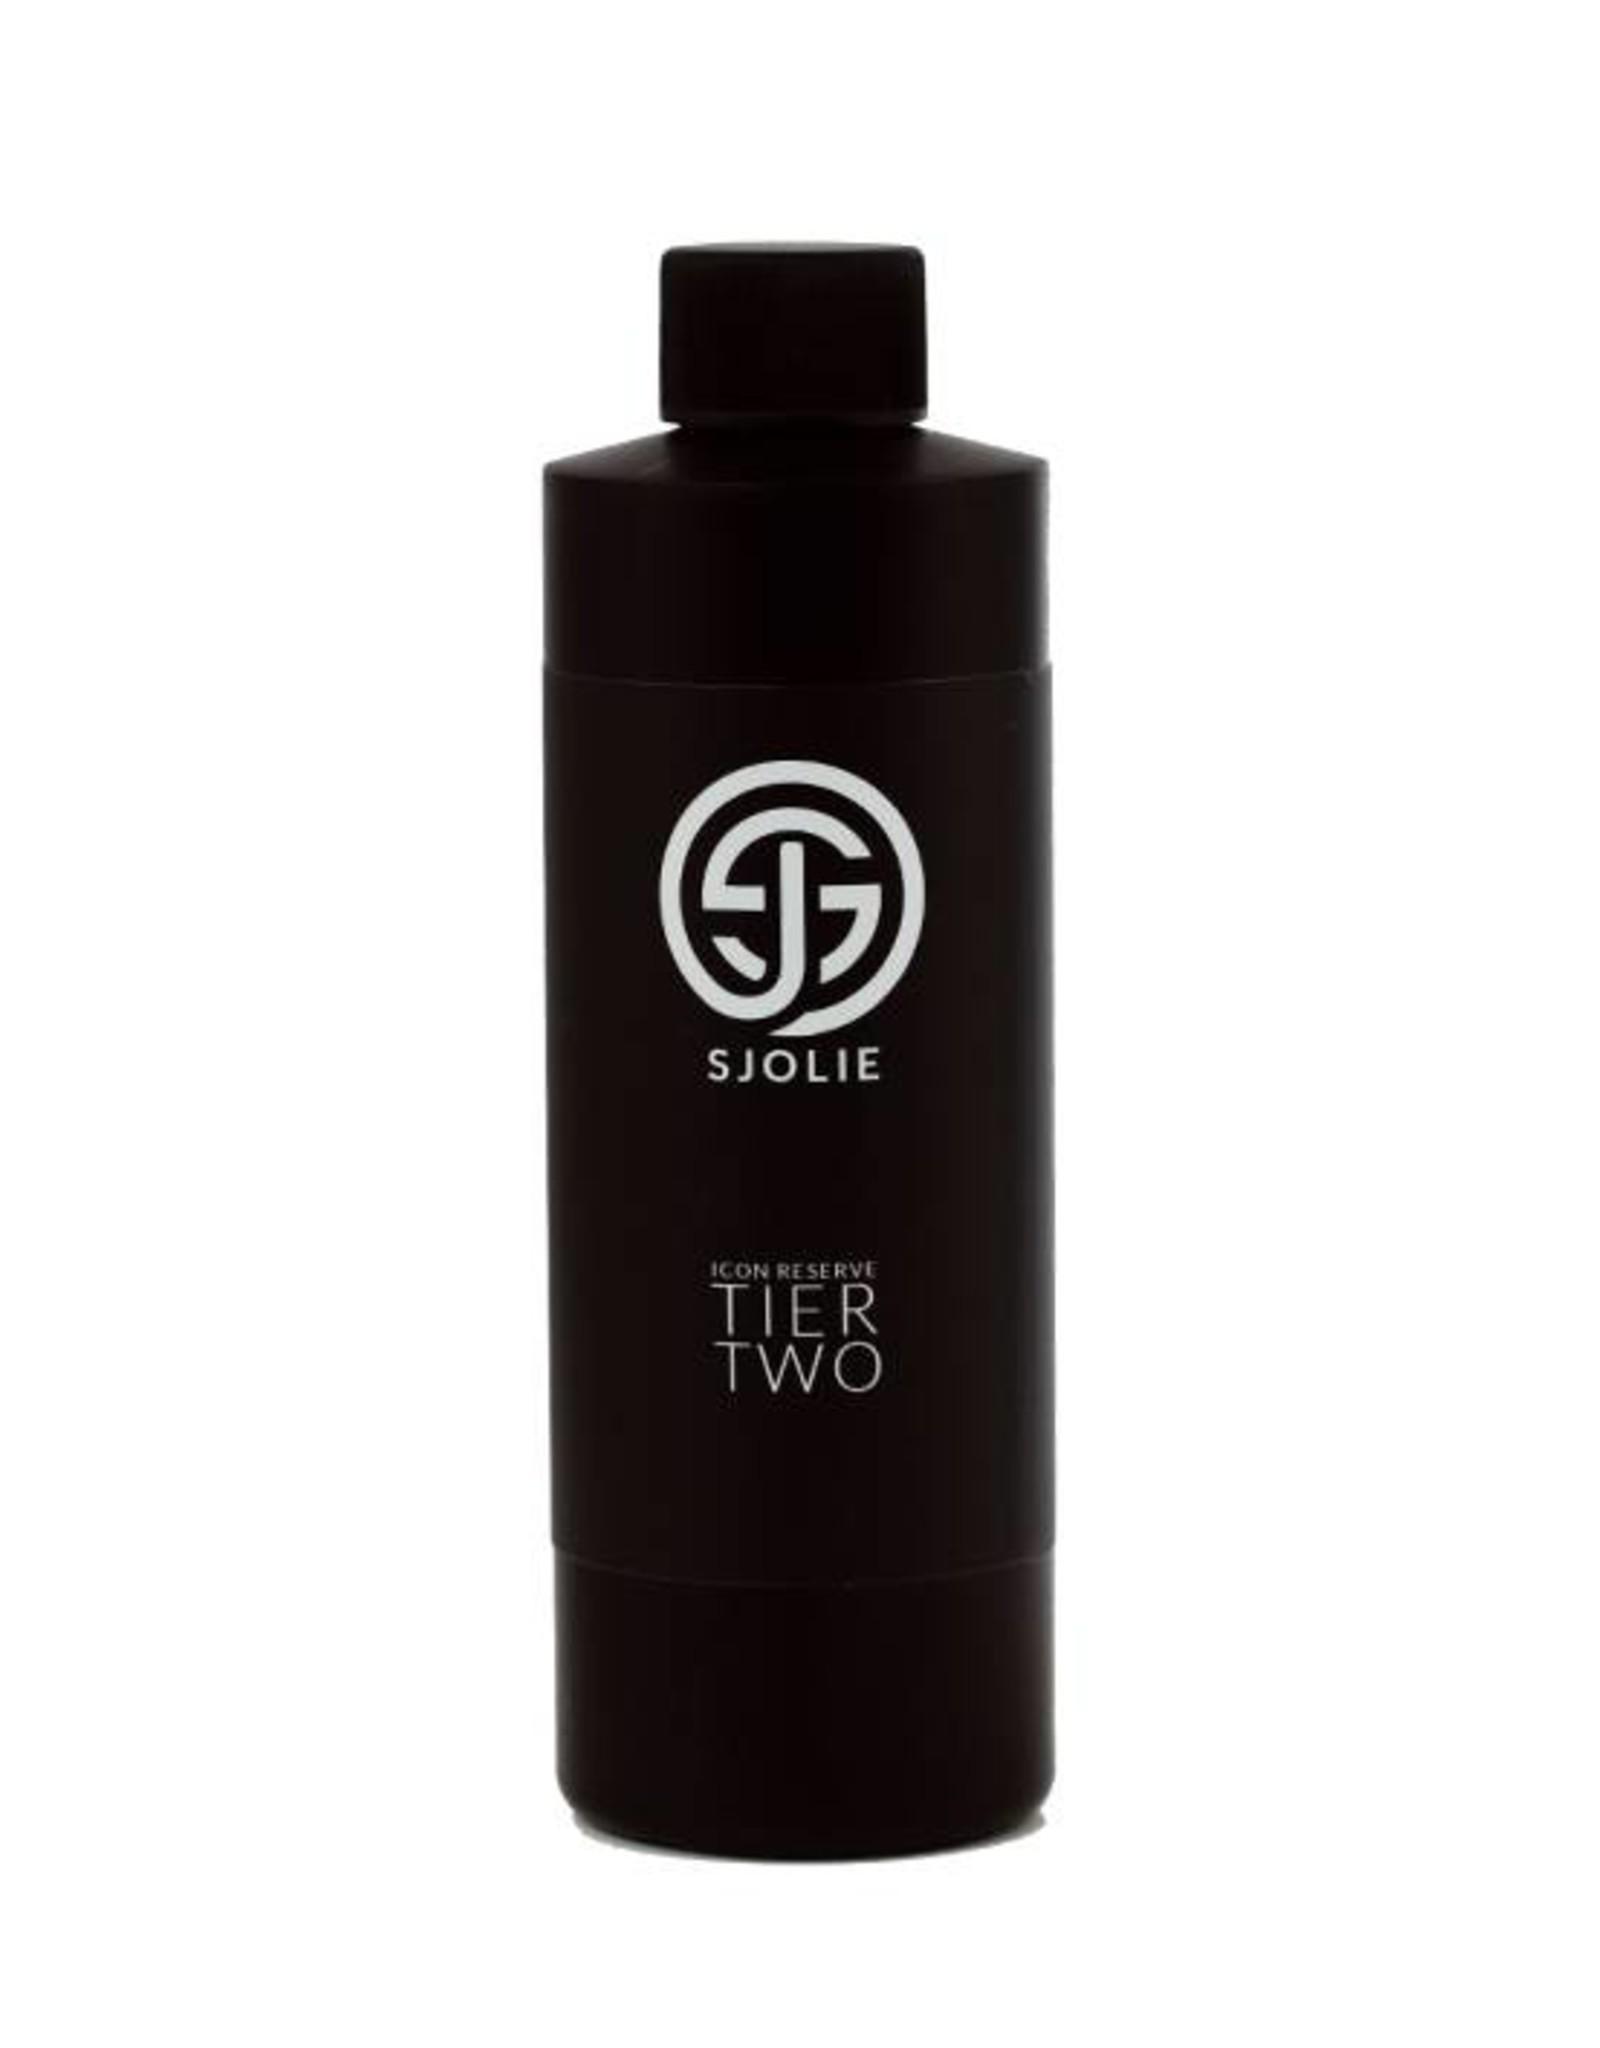 Sjolie Sjolie Tier Two - Fast Dry Solution - Spray Tan vloeistof